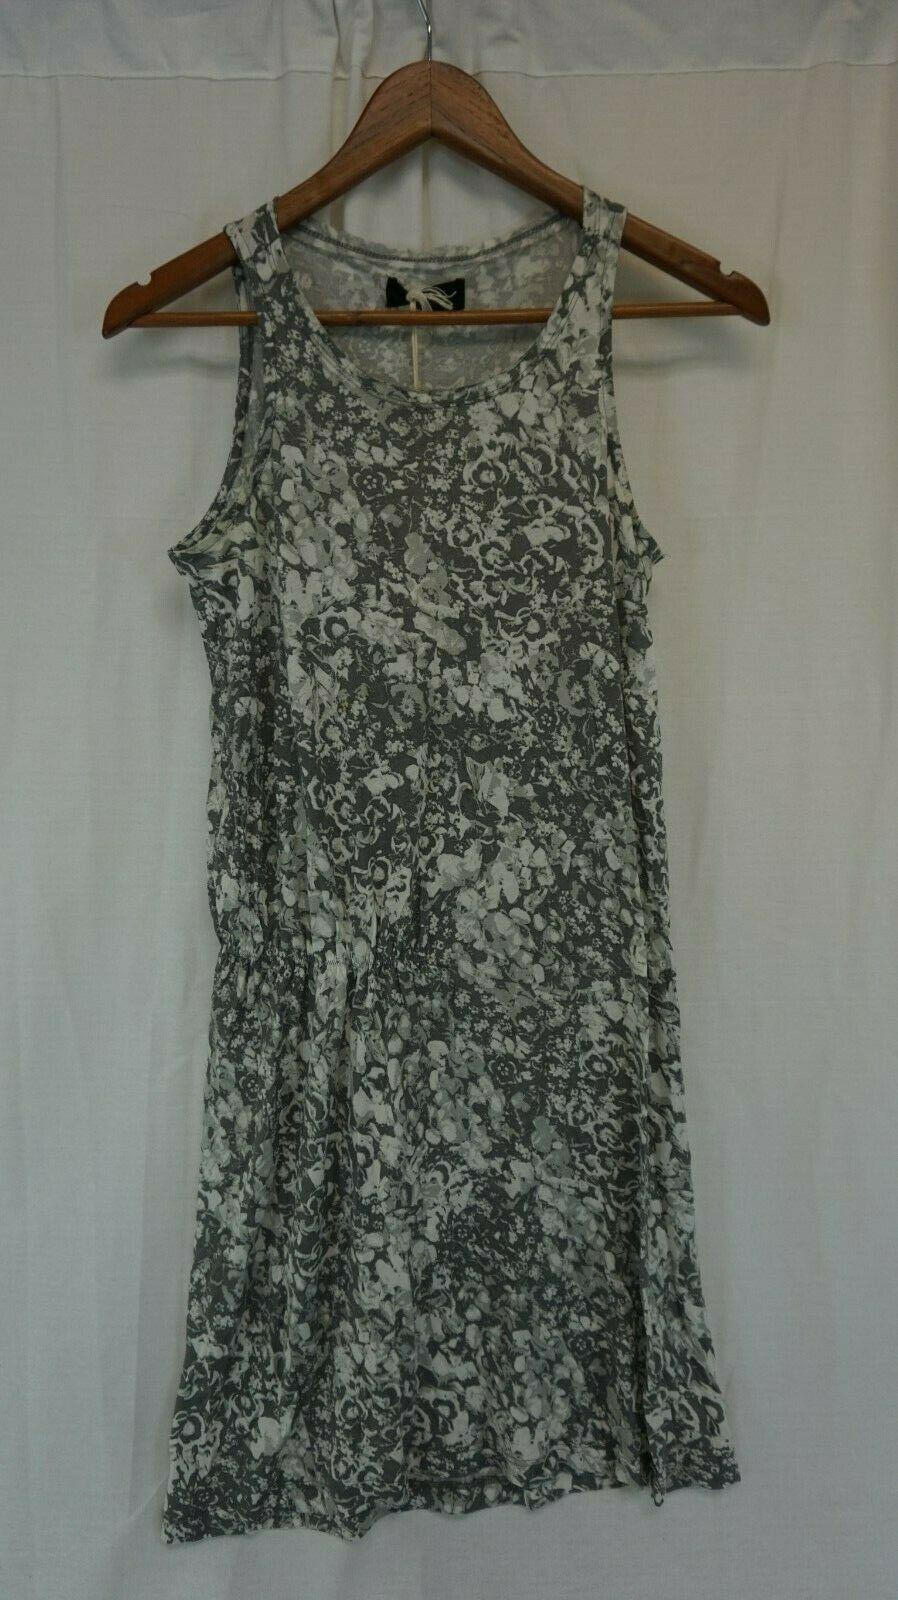 NWT DIESEL Women's Gray Floral D-Akir-B Scoop Neck Shift Dress XS